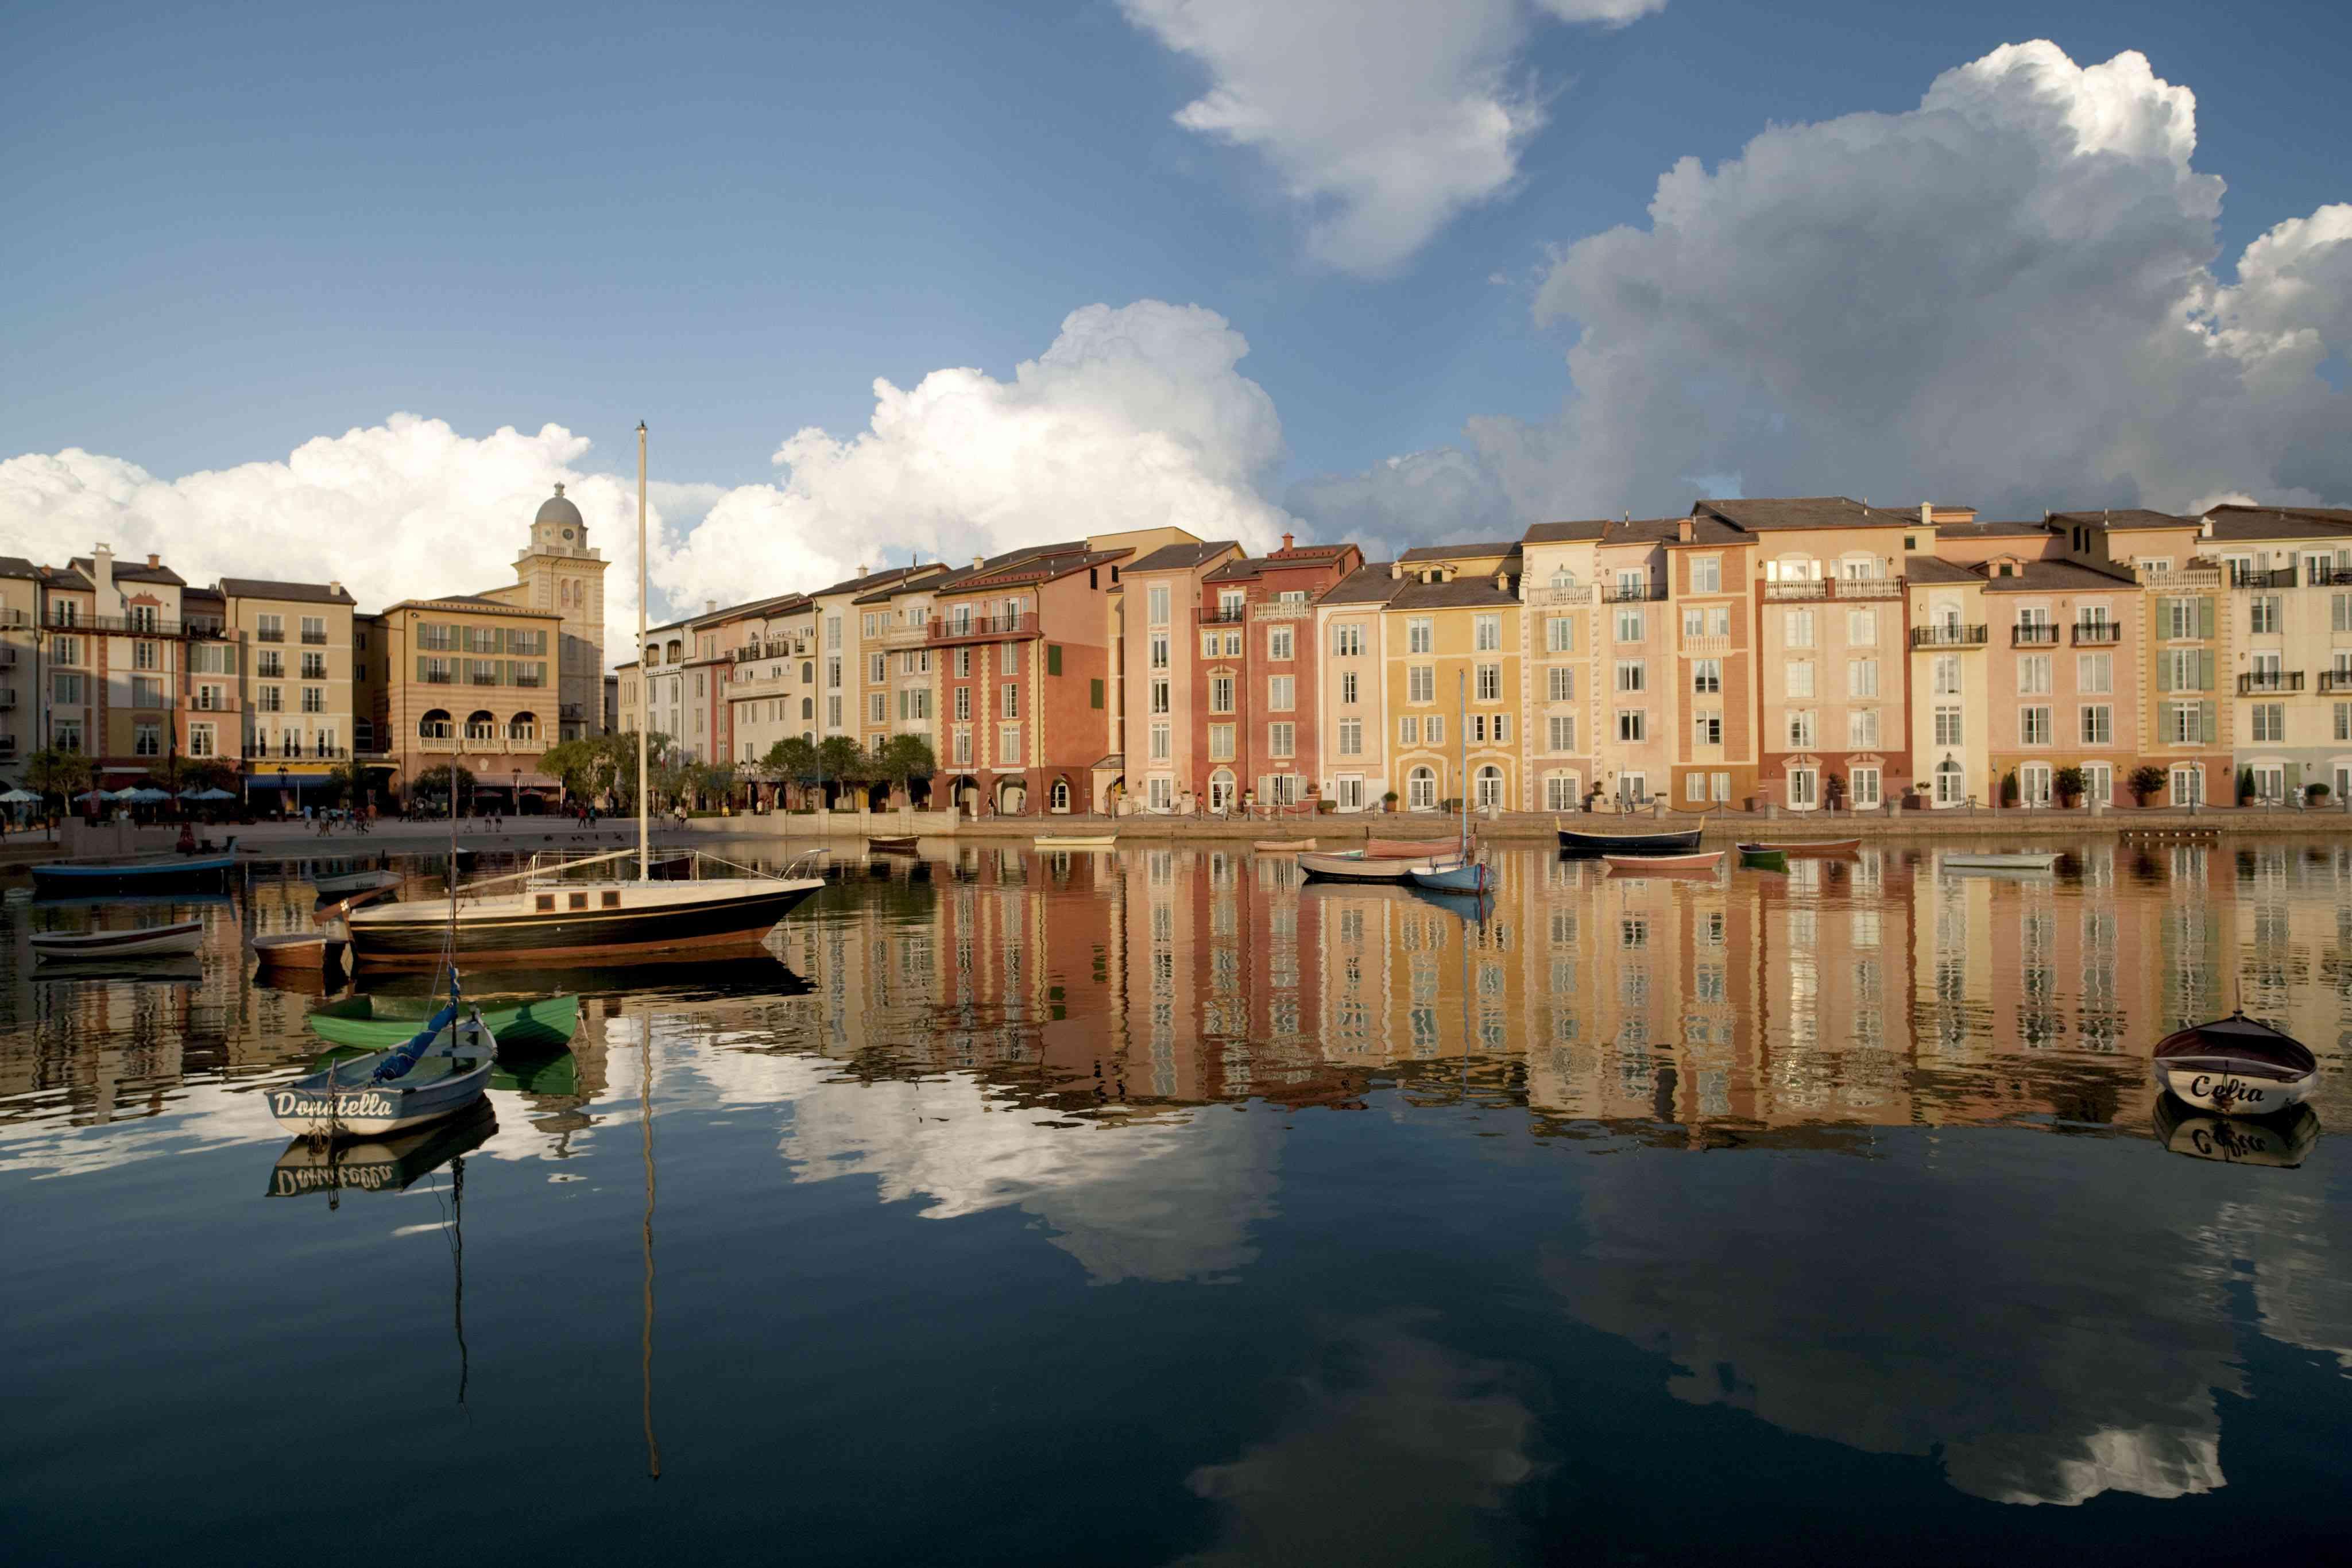 Universal Orlando Portofino Bay Hotel with cobblestone streets and outdoor cafes,